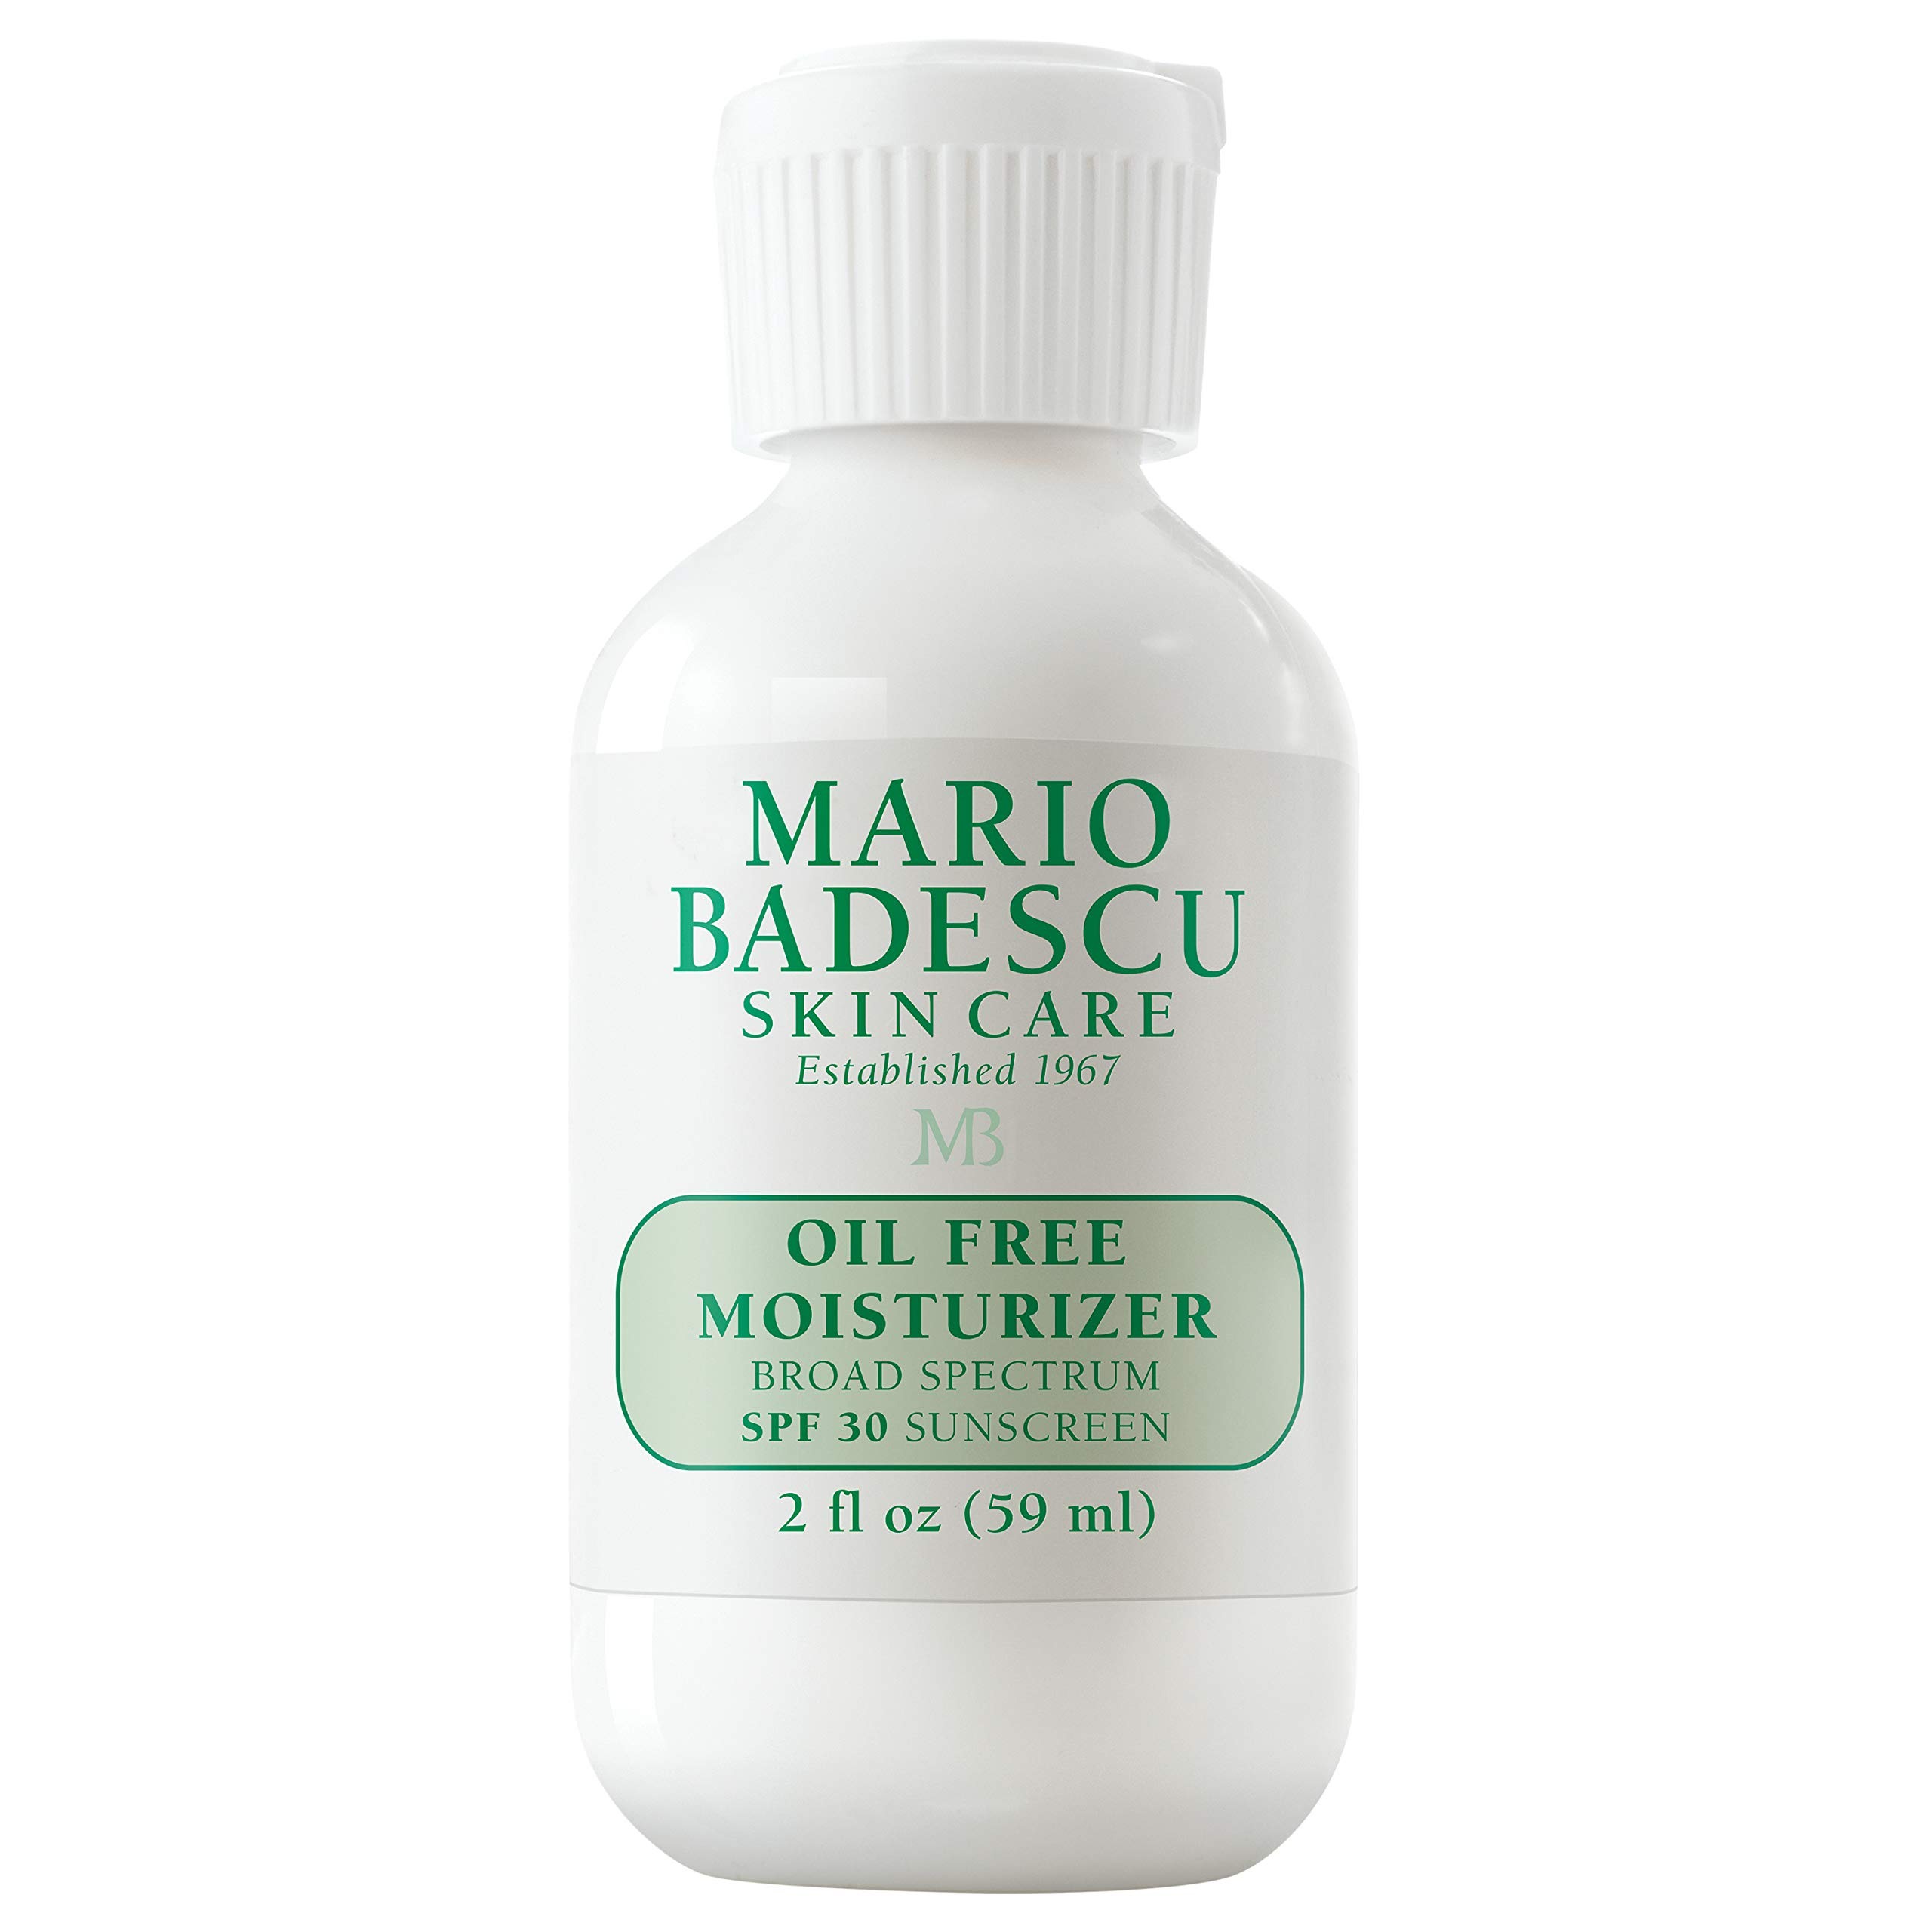 Mario Badescu Oil Free Moisturizer SPF 30, 2 Fl Oz